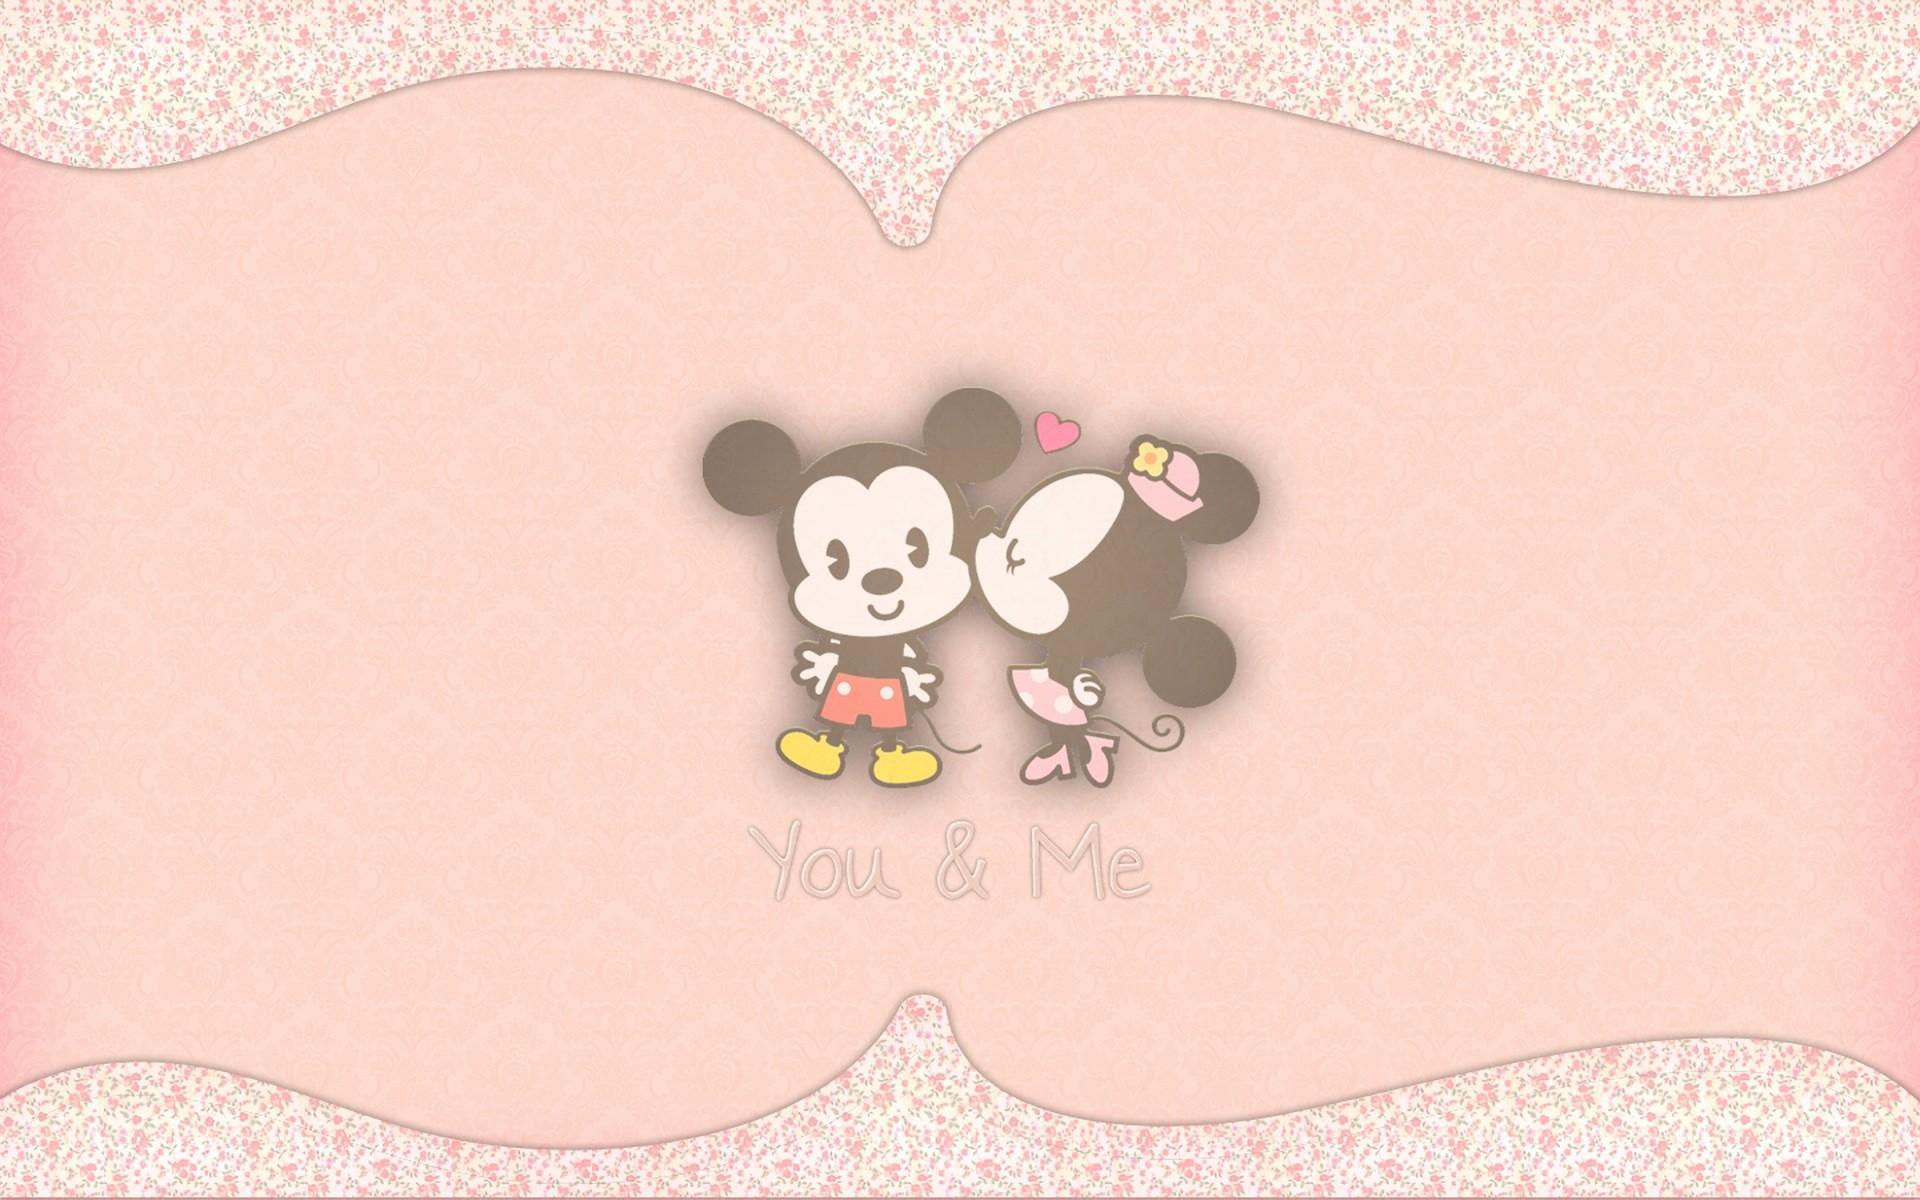 Fondos De Pantalla Dibujo Ilustración Mickey Mouse Amor